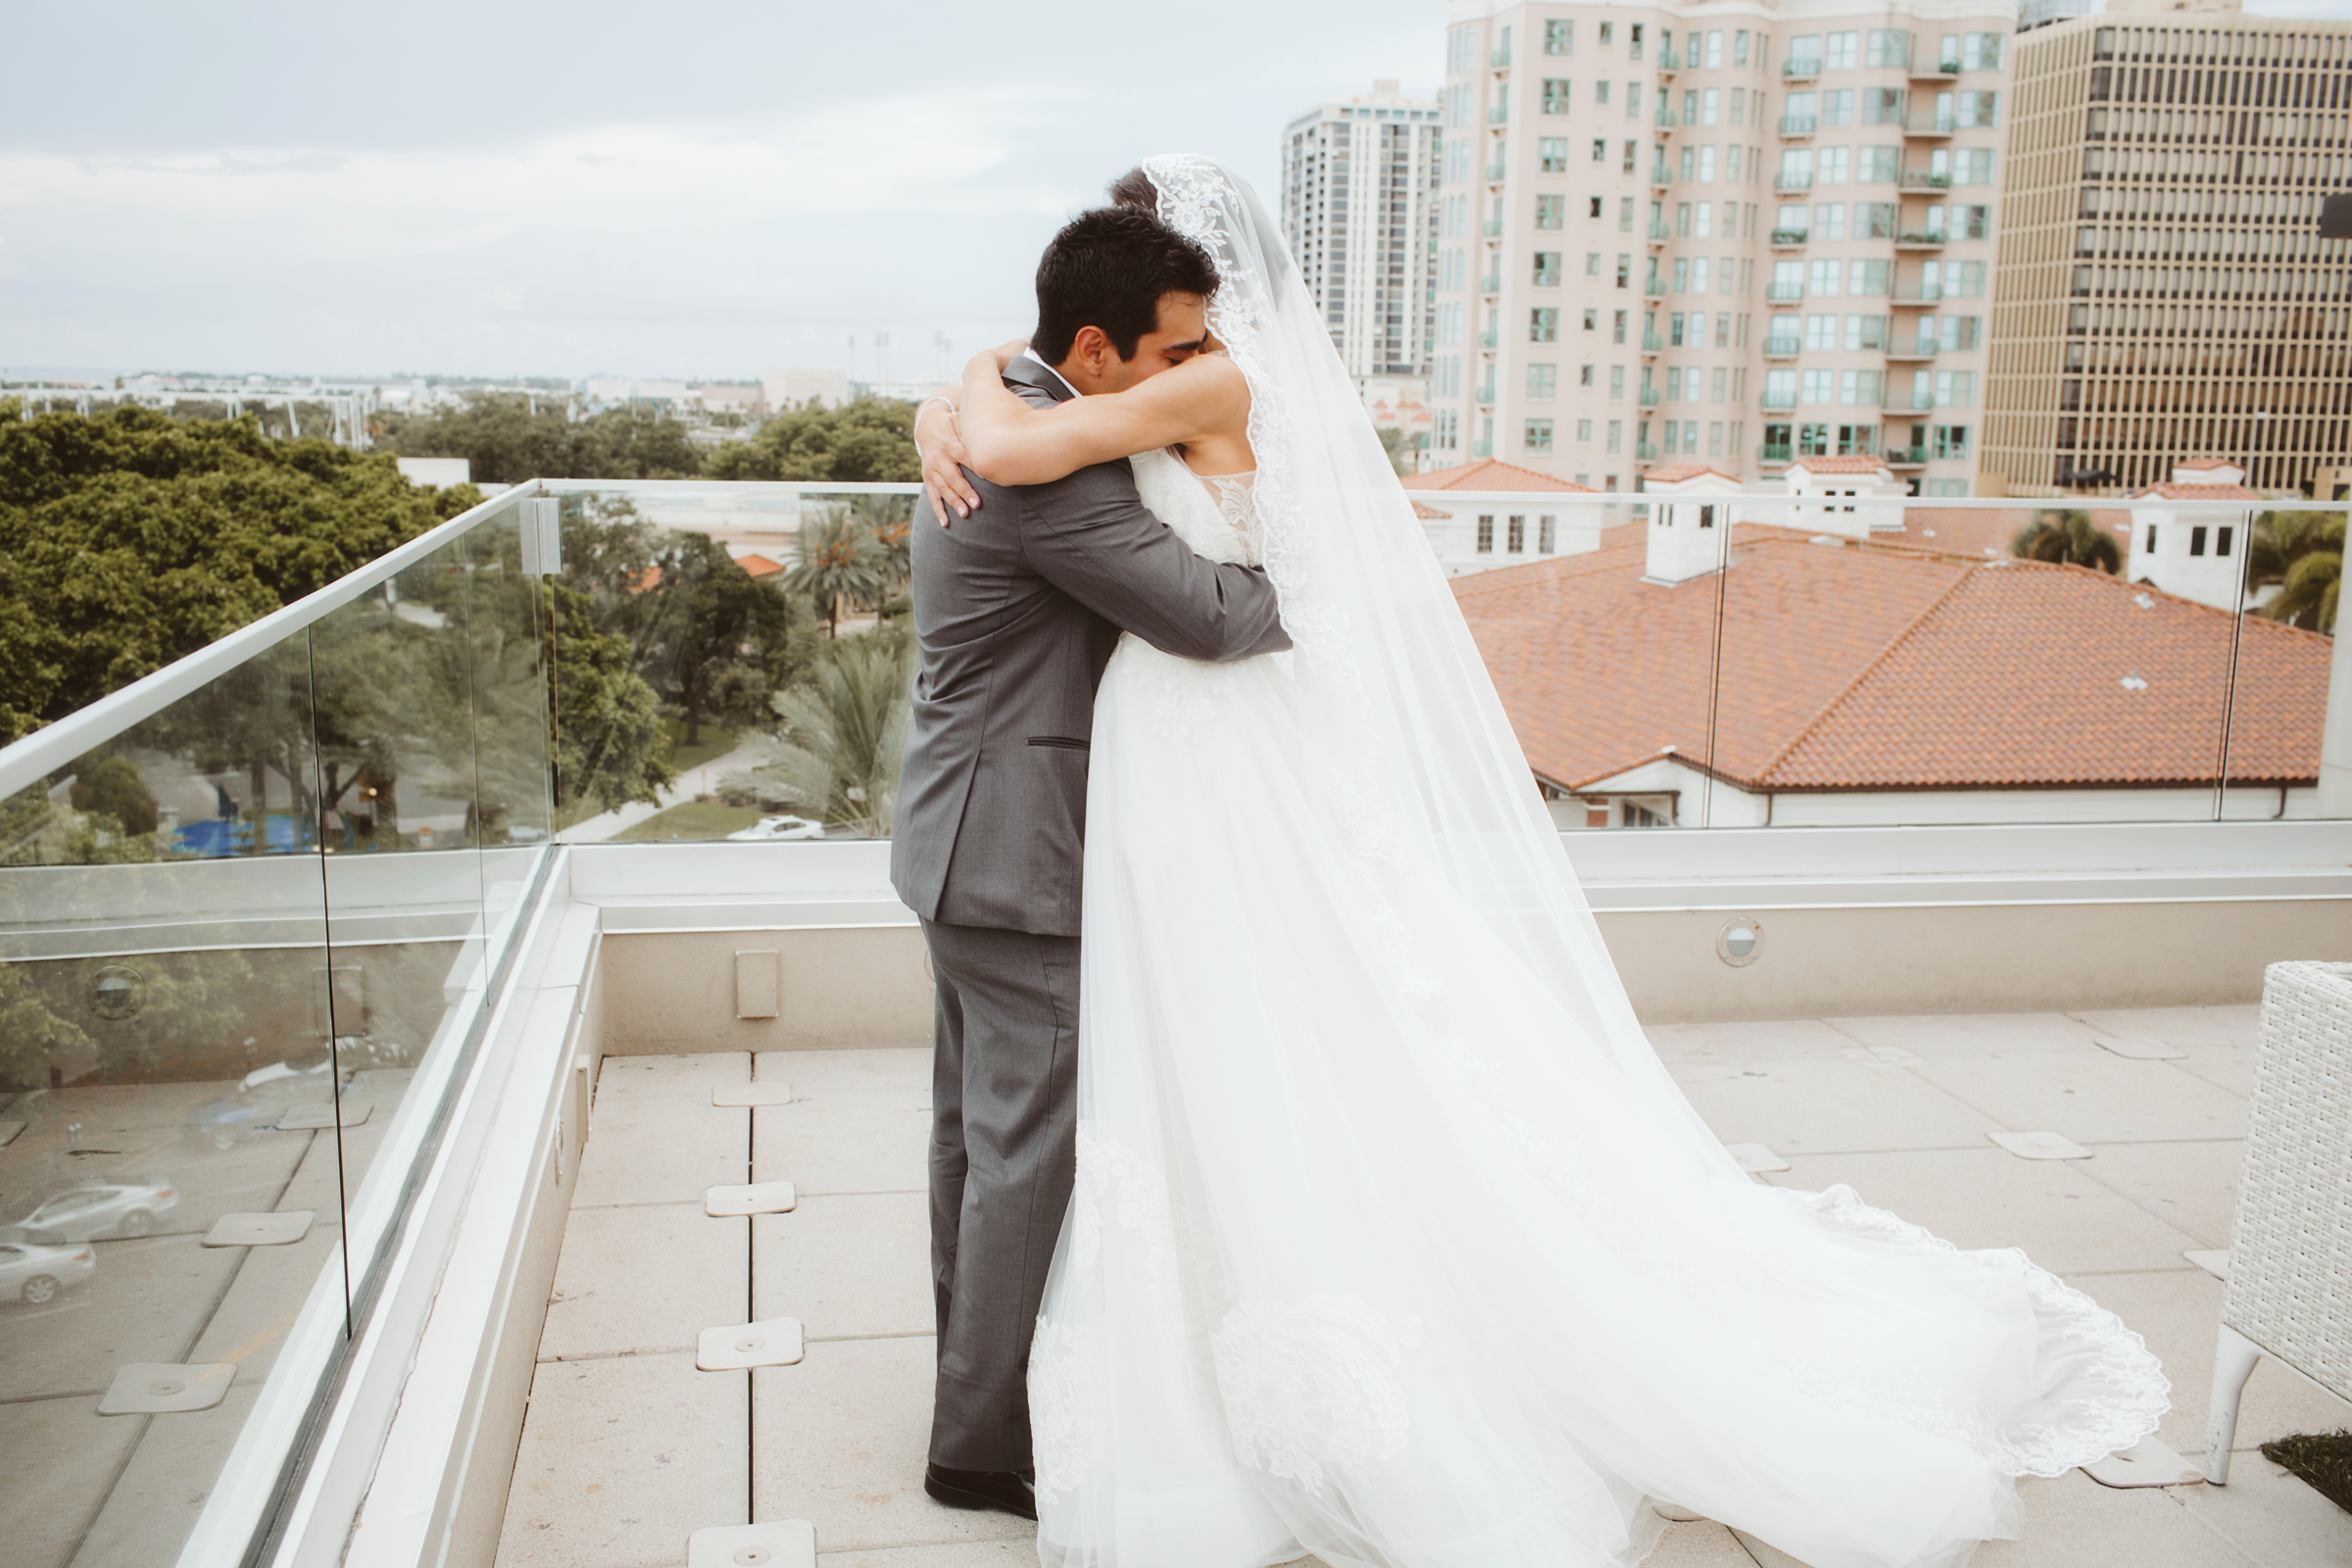 wedding day | MFA St Pete | Vanessa Boy Photography | vanessaboy.com-149.com |final.jpg